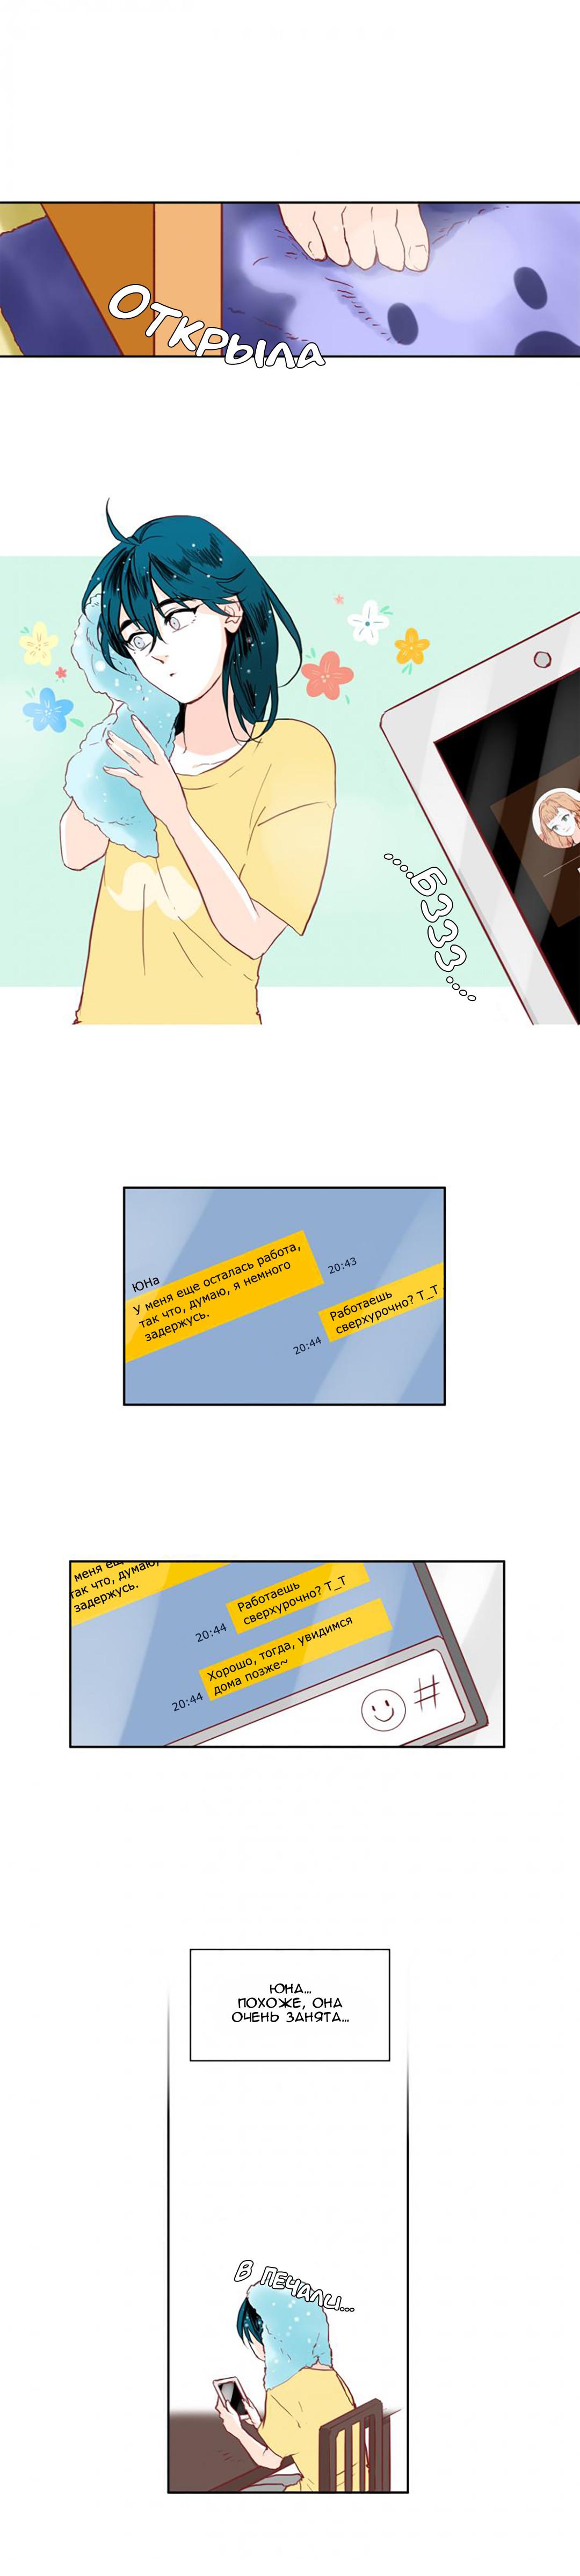 https://r1.ninemanga.com/comics/pic2/30/31902/1056680/1540161701941.jpg Page 1